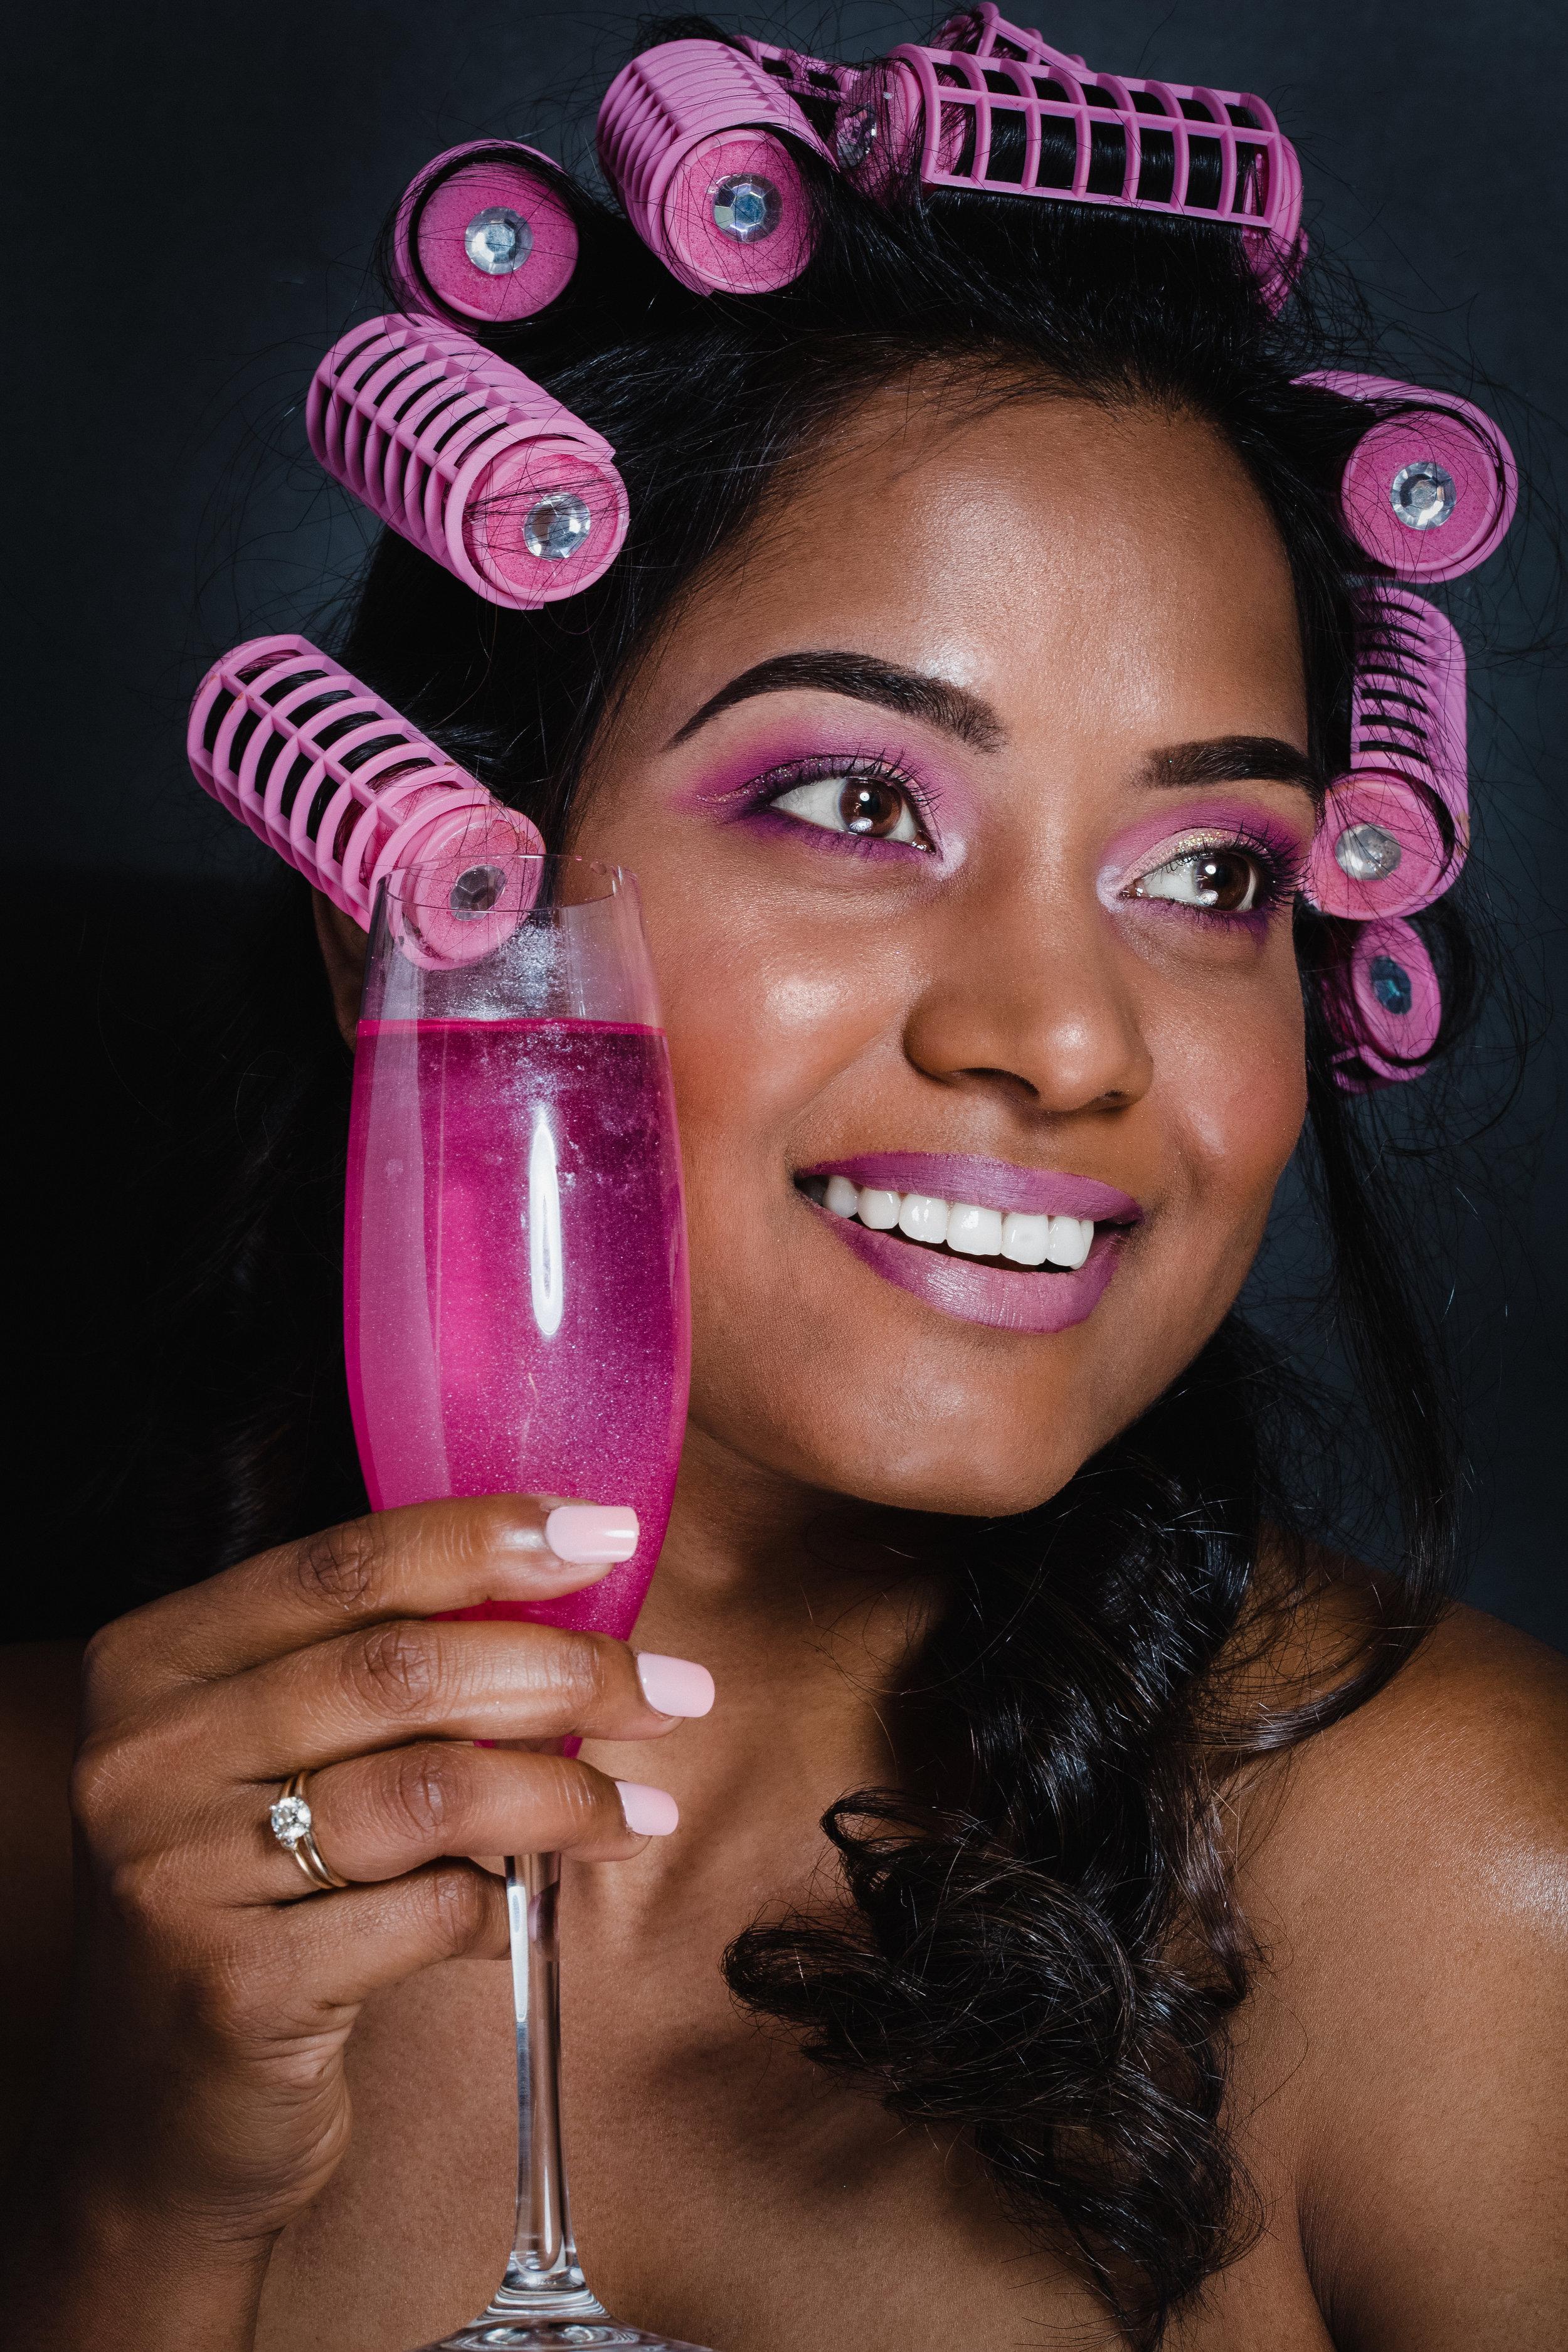 Photographer:  @jachristo /Retoucher: @luisparradesign   Makeup:  @mua.lay   Model:  @  hjnoorie   Text:  @im_kelpsea